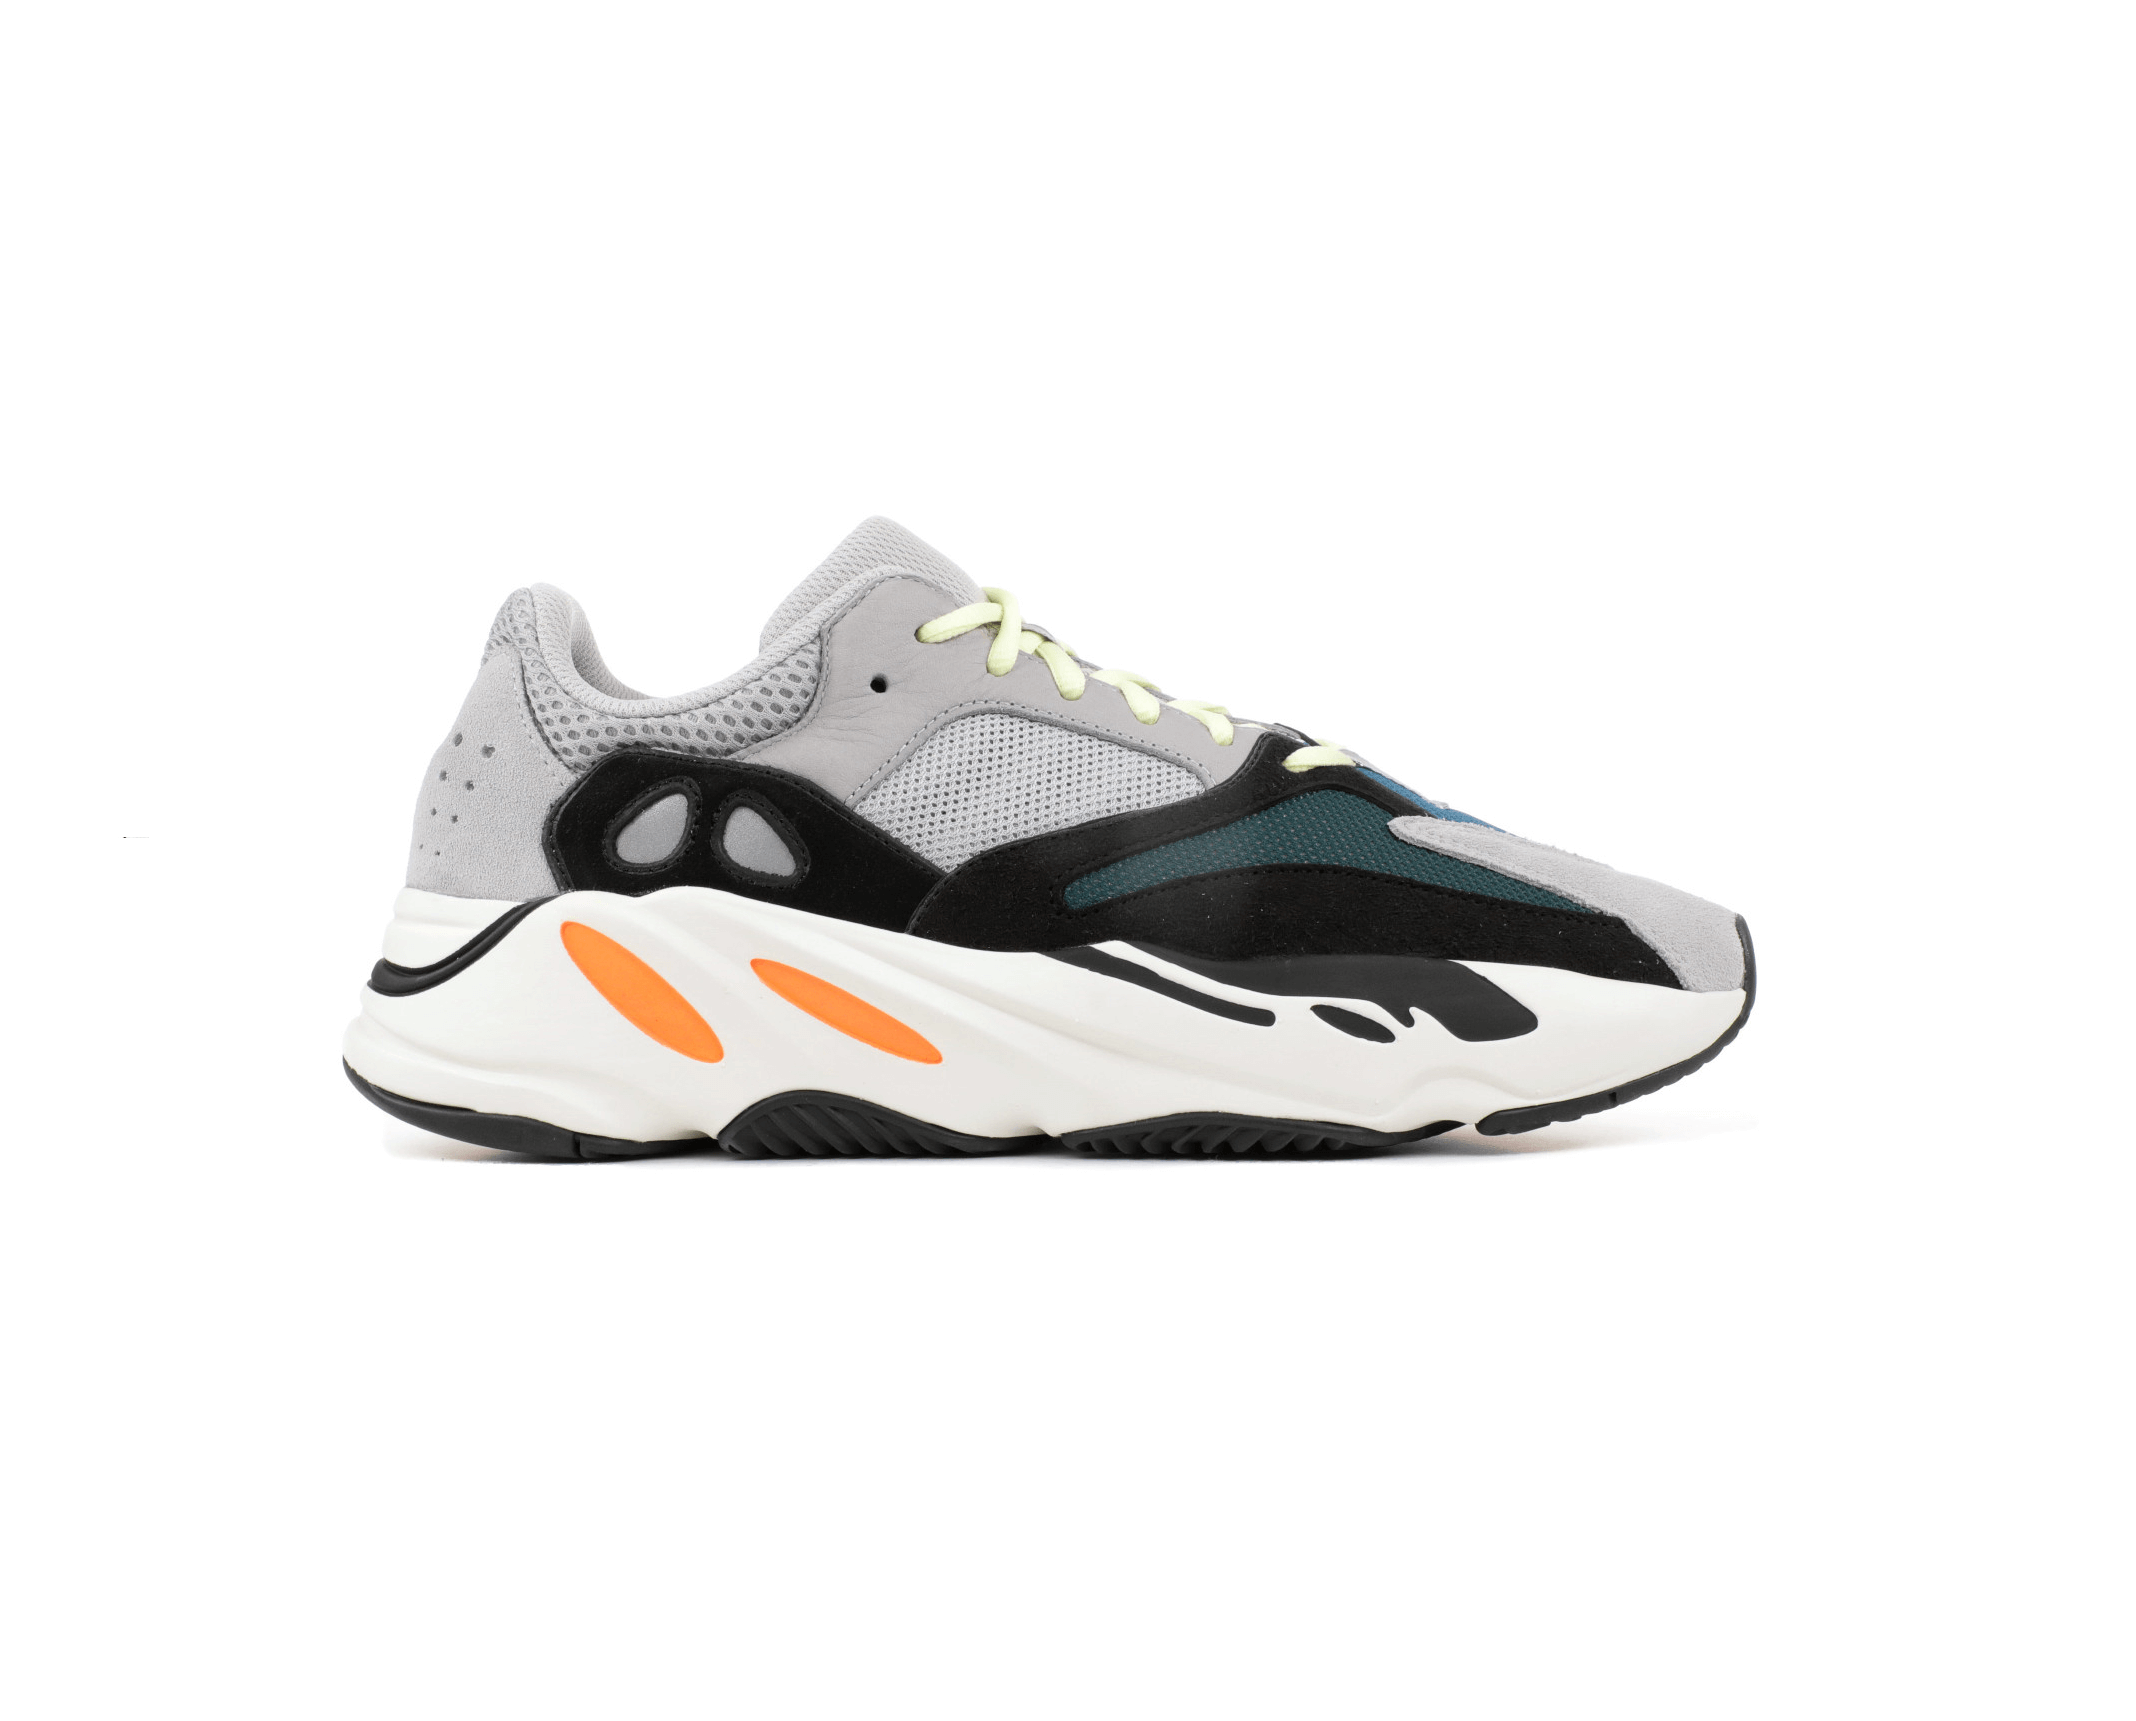 eb825233e3b Adidas Yeezy 700 Wave Runner – Kerimago